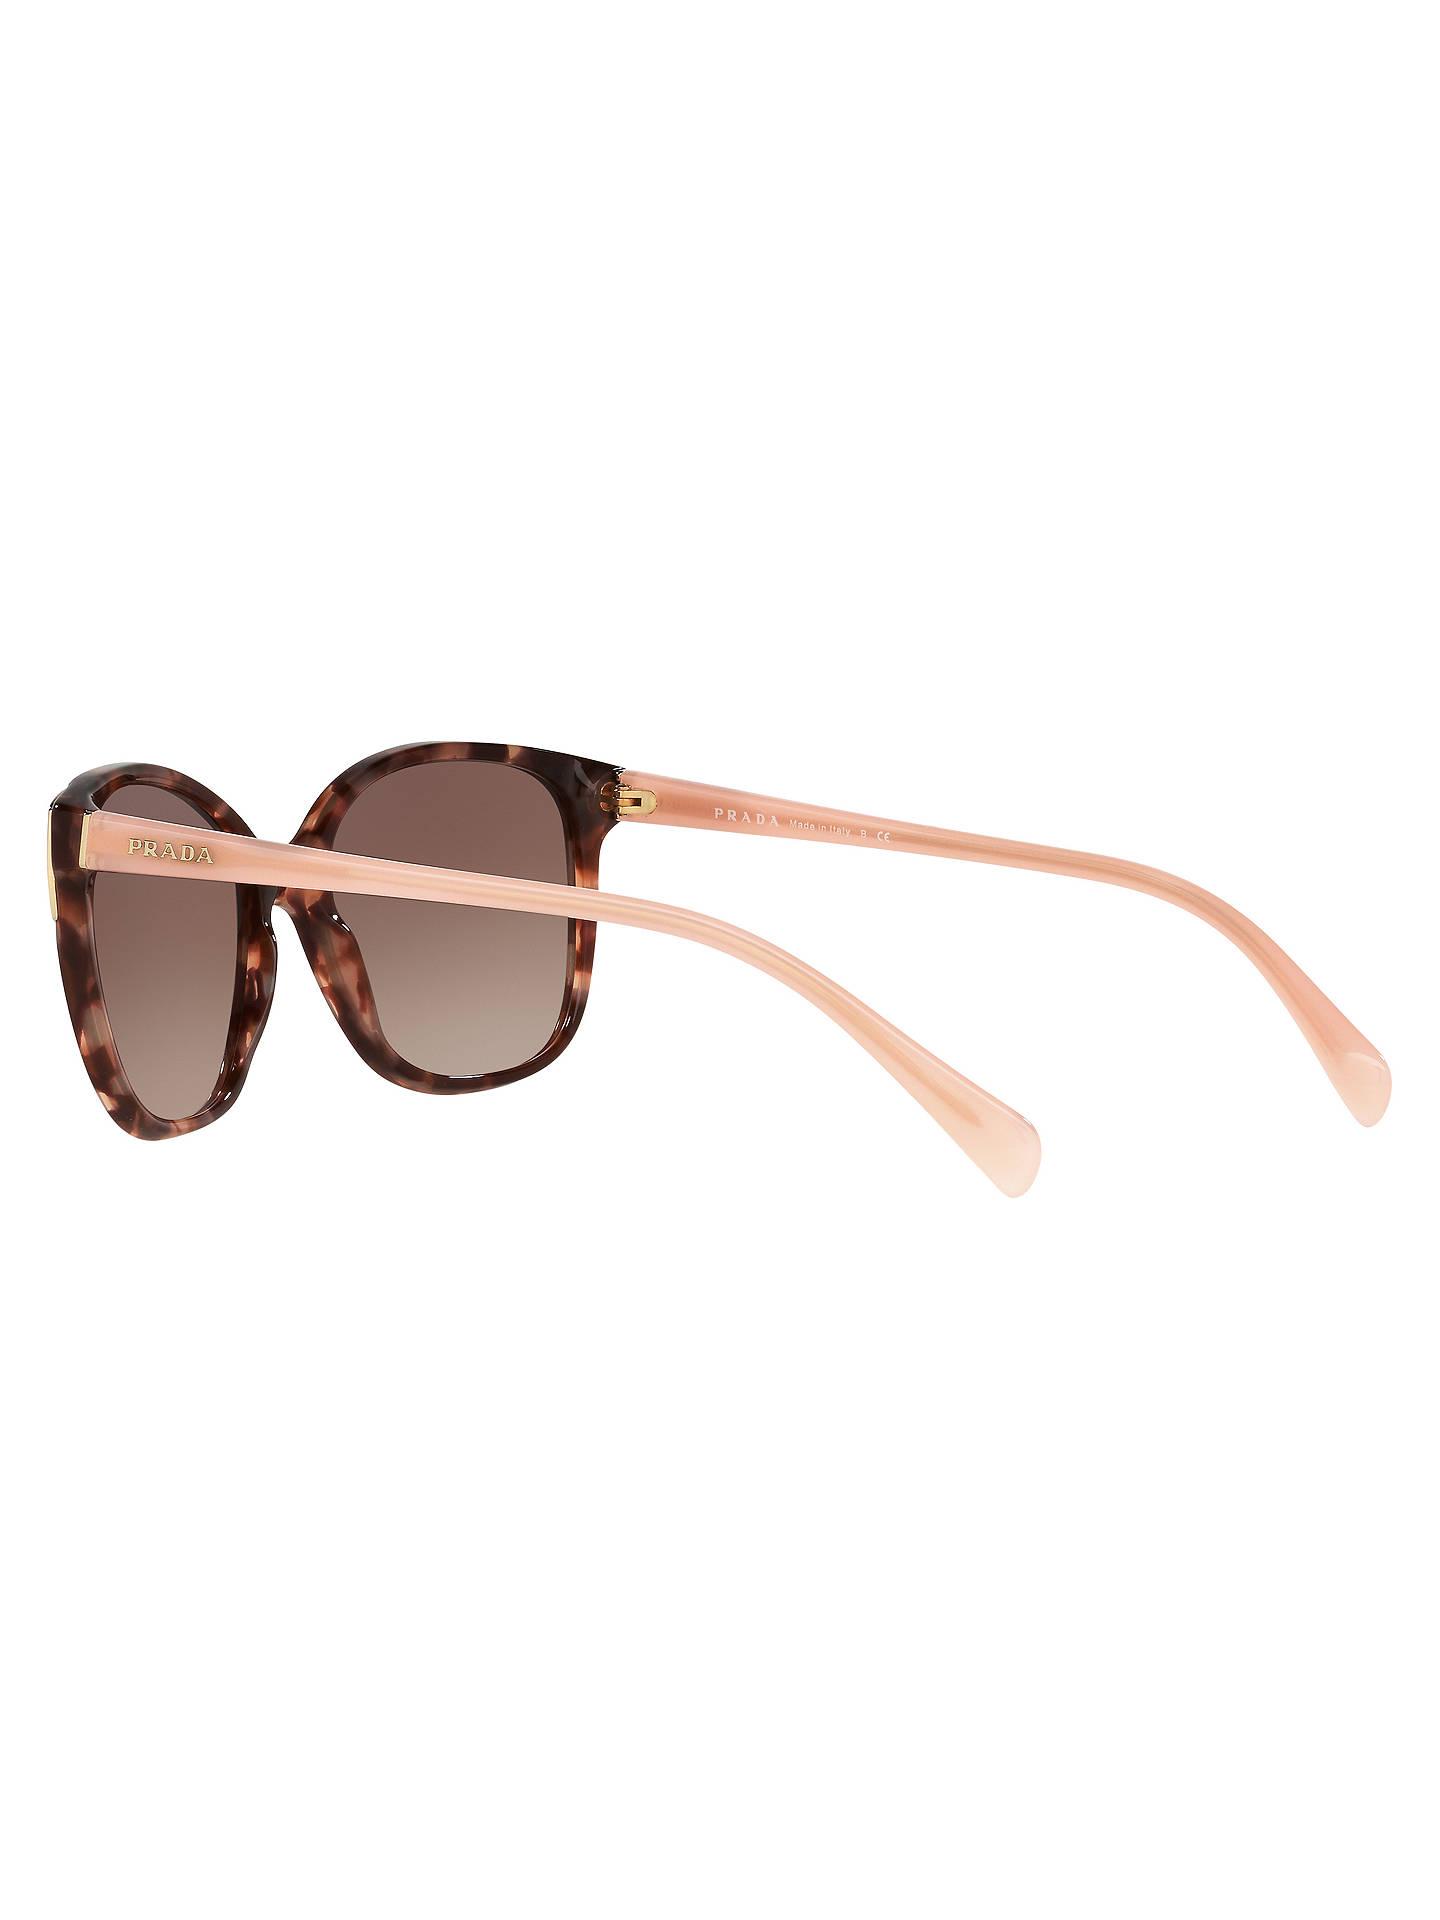 244d753db06e Prada PR 01OS Square Sunglasses at John Lewis   Partners